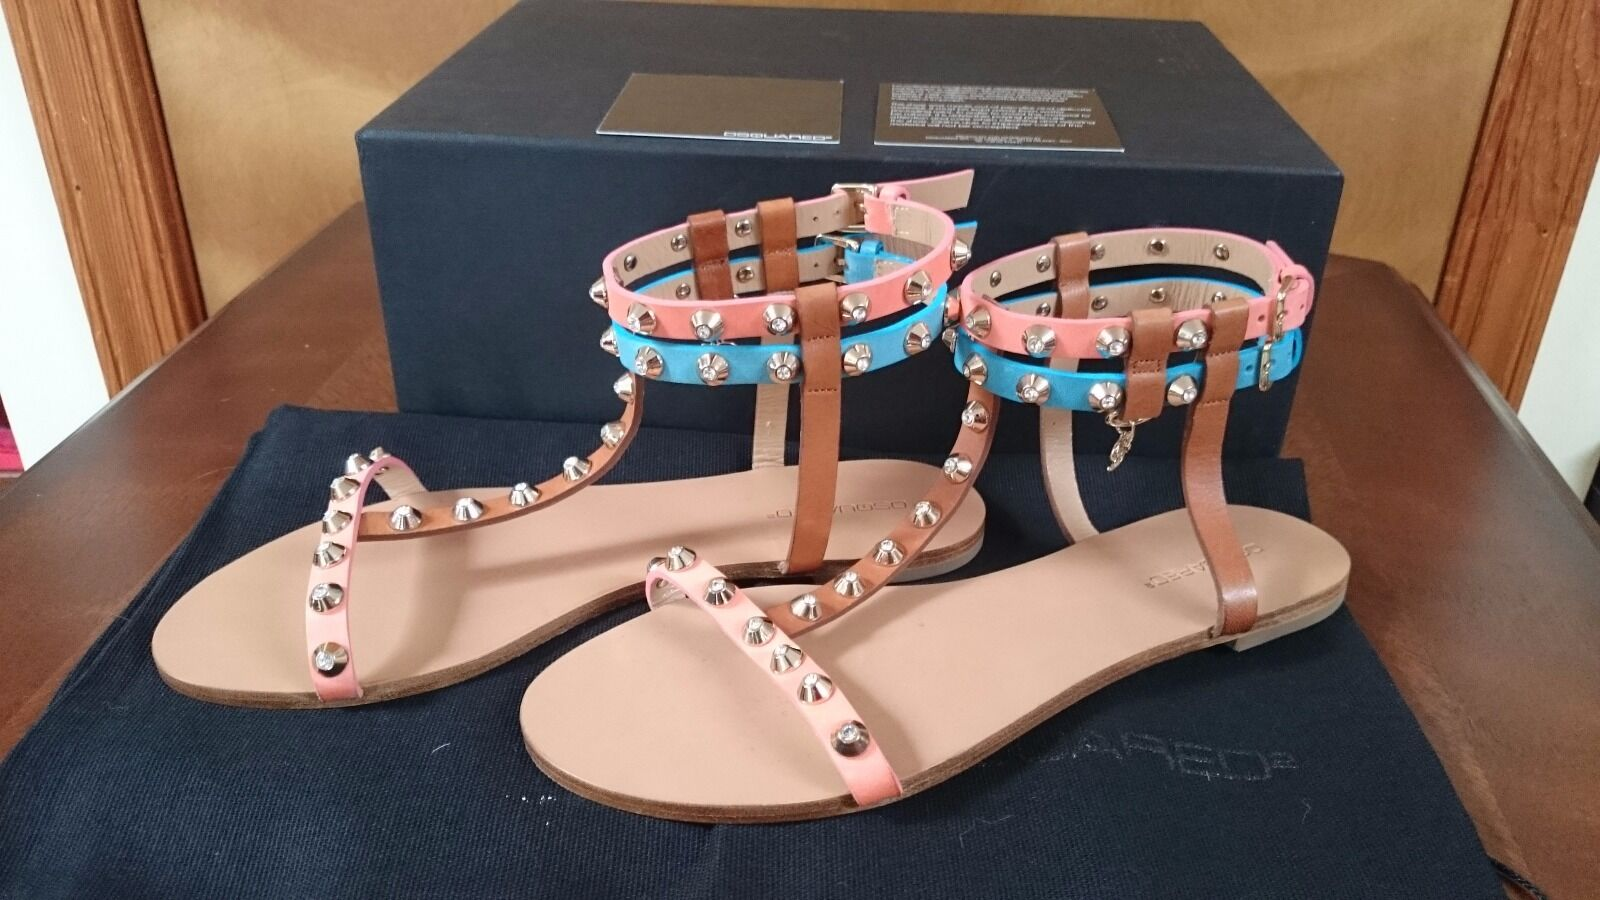 DSQUArosso2 Vacchetta Vega Doppia  Ankle Strap -Rhineston Studi Flat Sandal 7.5  migliore offerta